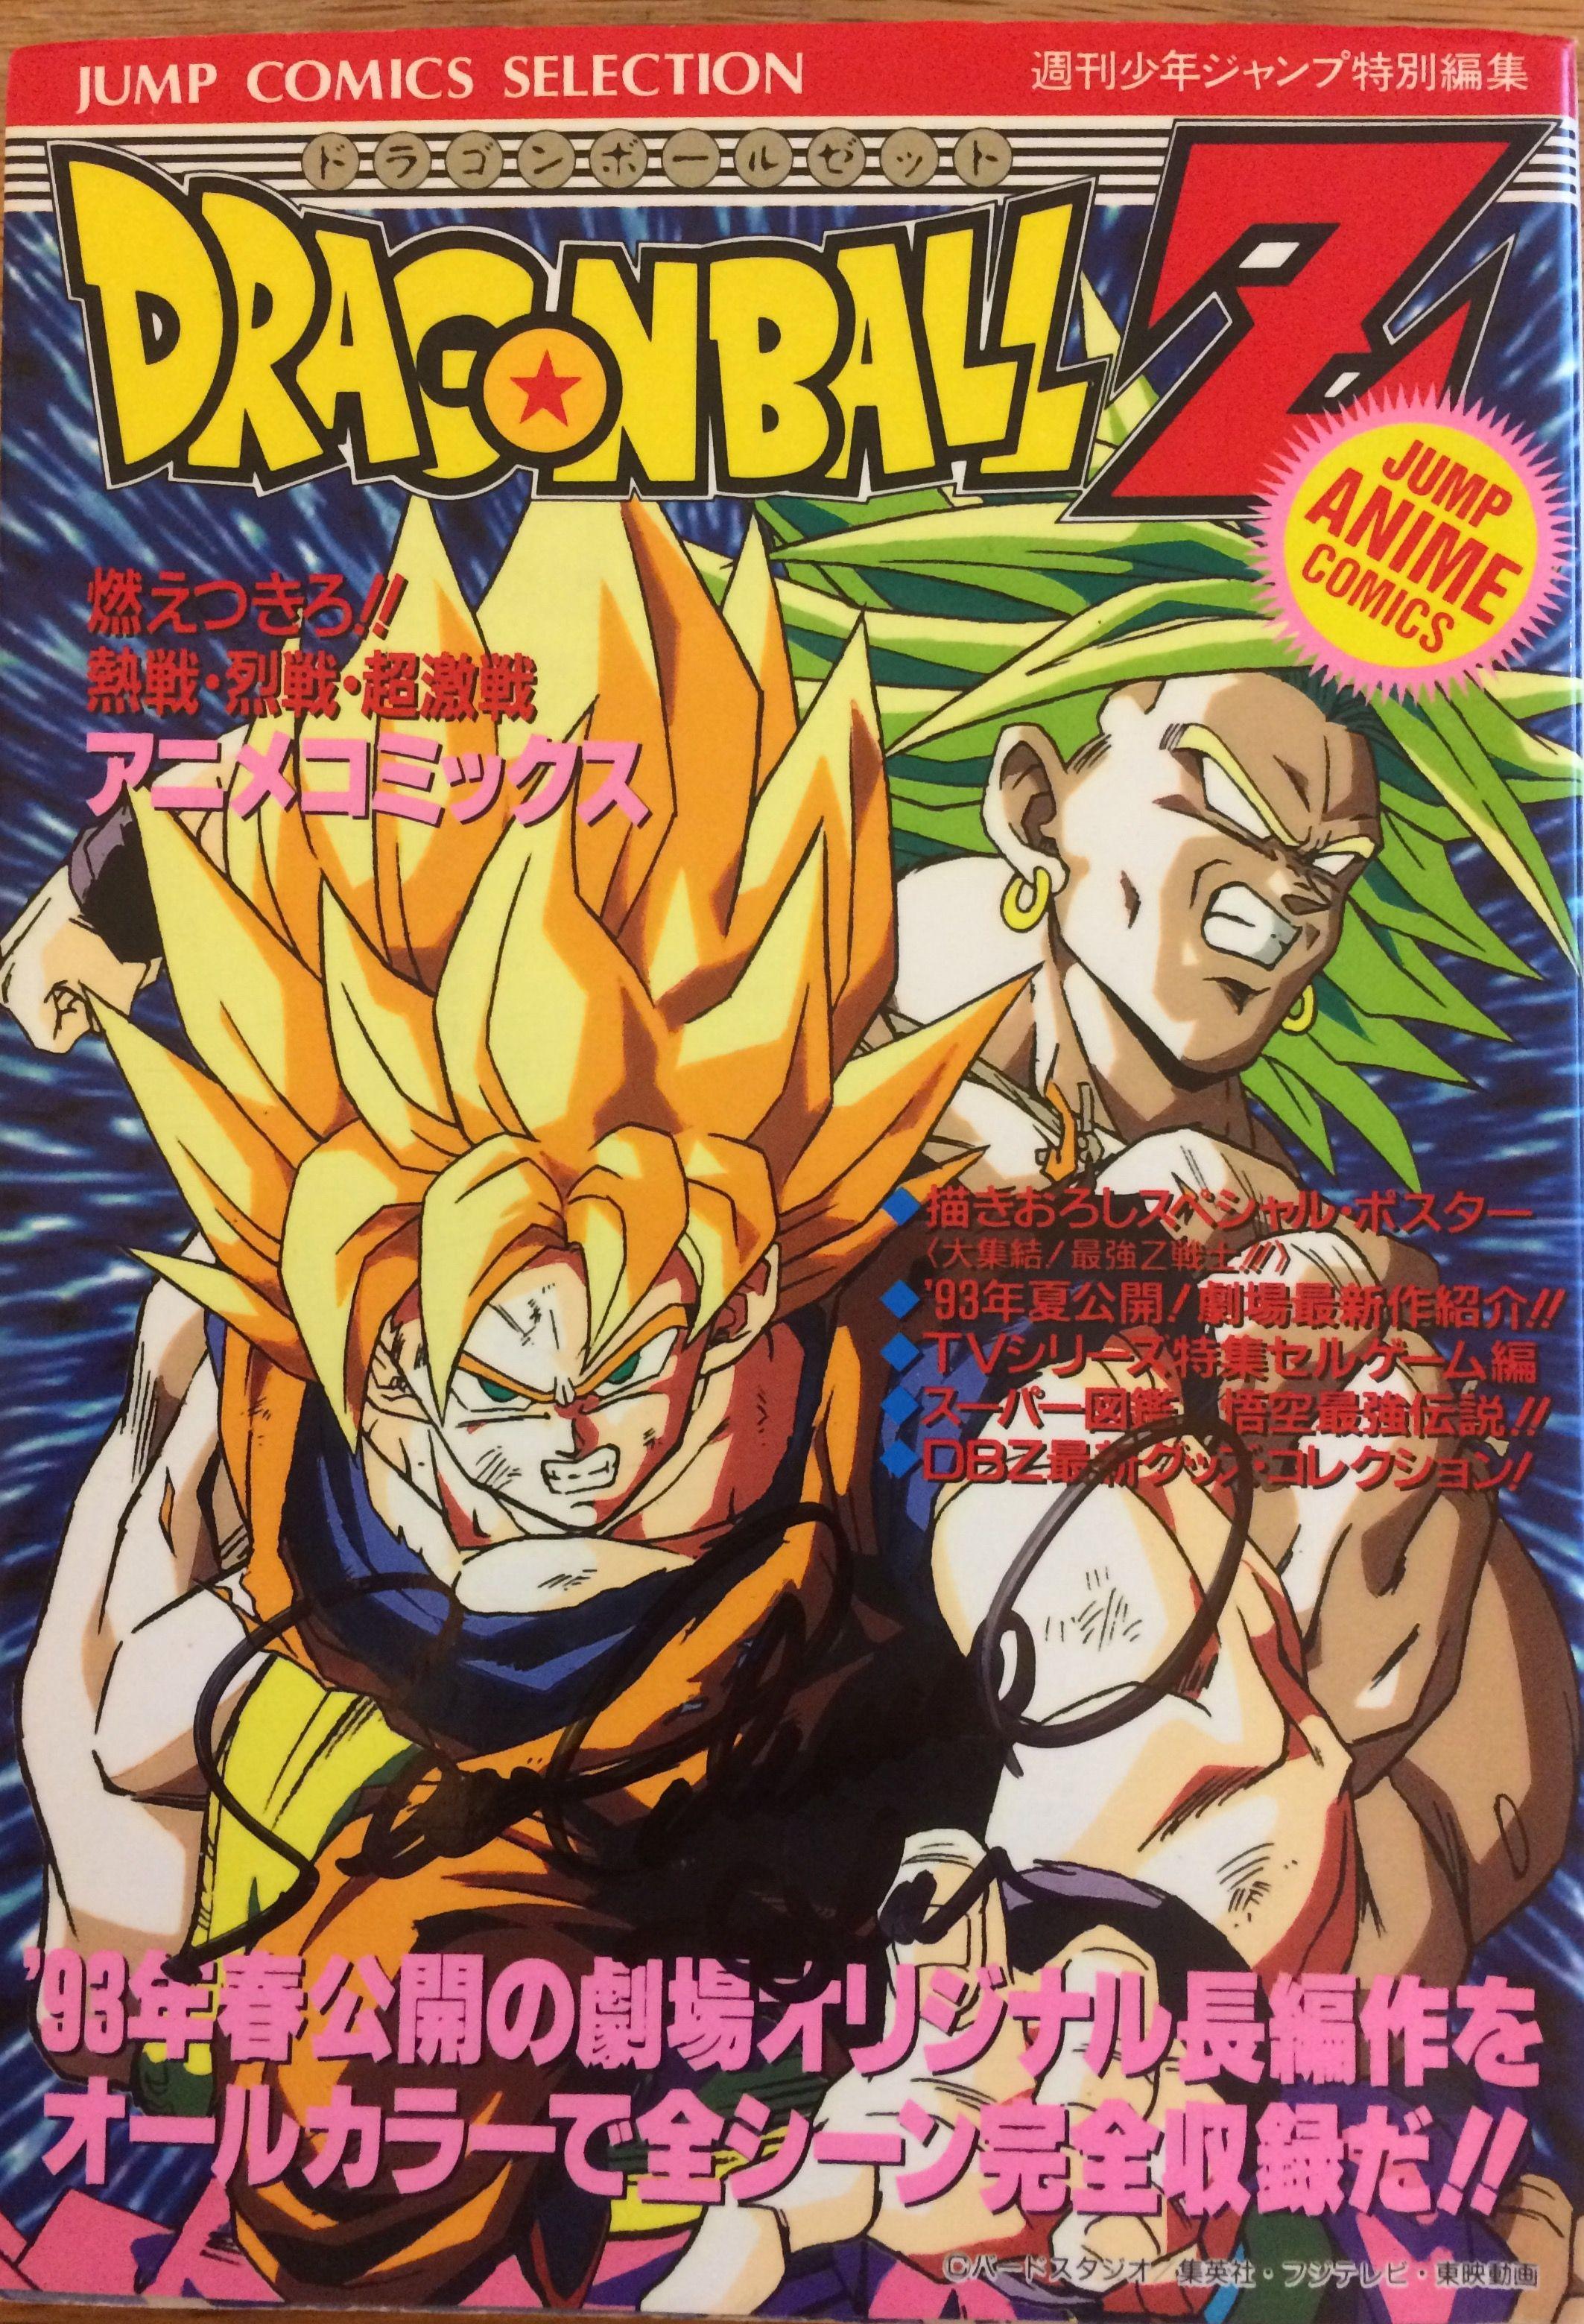 Dragon Ball Z 6 Broly The Legendary Super Saiyan By Jump Comics1993 Signed Sean Schemmel Goku June 4 2017 At Wizard World Con